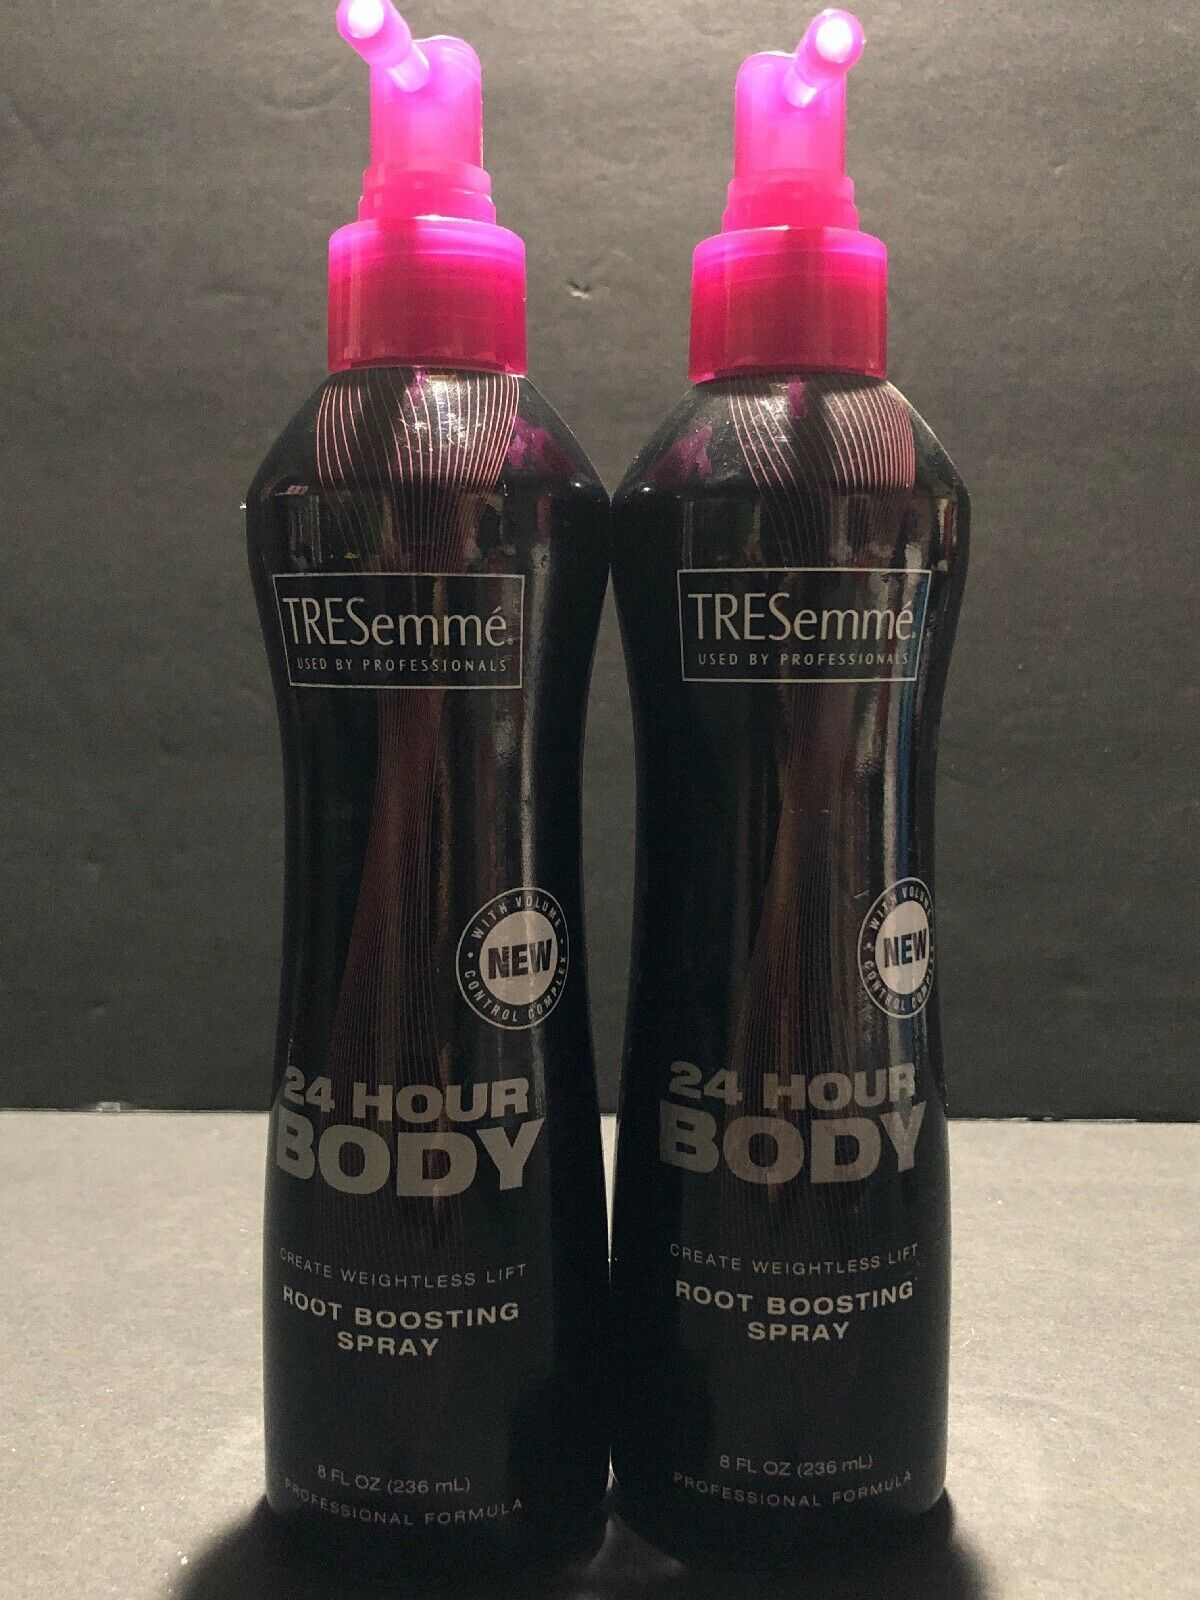 TRESemme 24 Hour Body Root Boosting Spray 8 fl oz (236mL) Lot Of 2 - $35.00